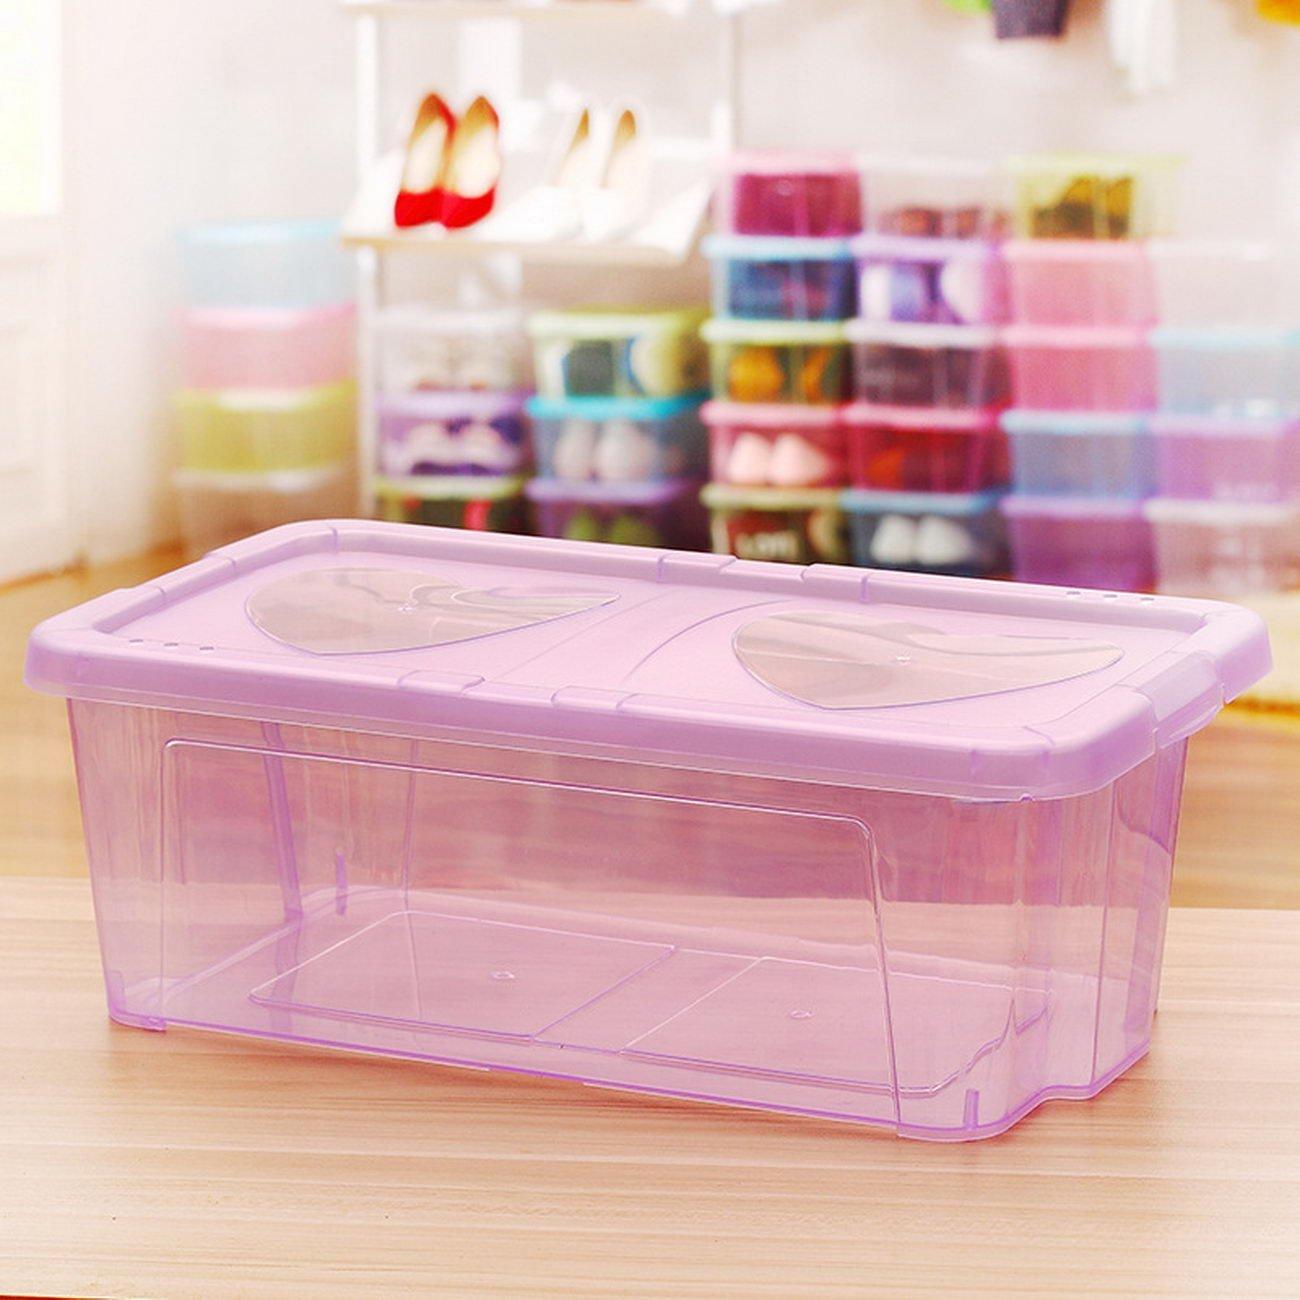 jii2030shann new fashion transparent shoebox shoebox multi stackable storage box home box, transparent shoe box, home supplies, and more storage box, stackable shoe box, creative shoe box